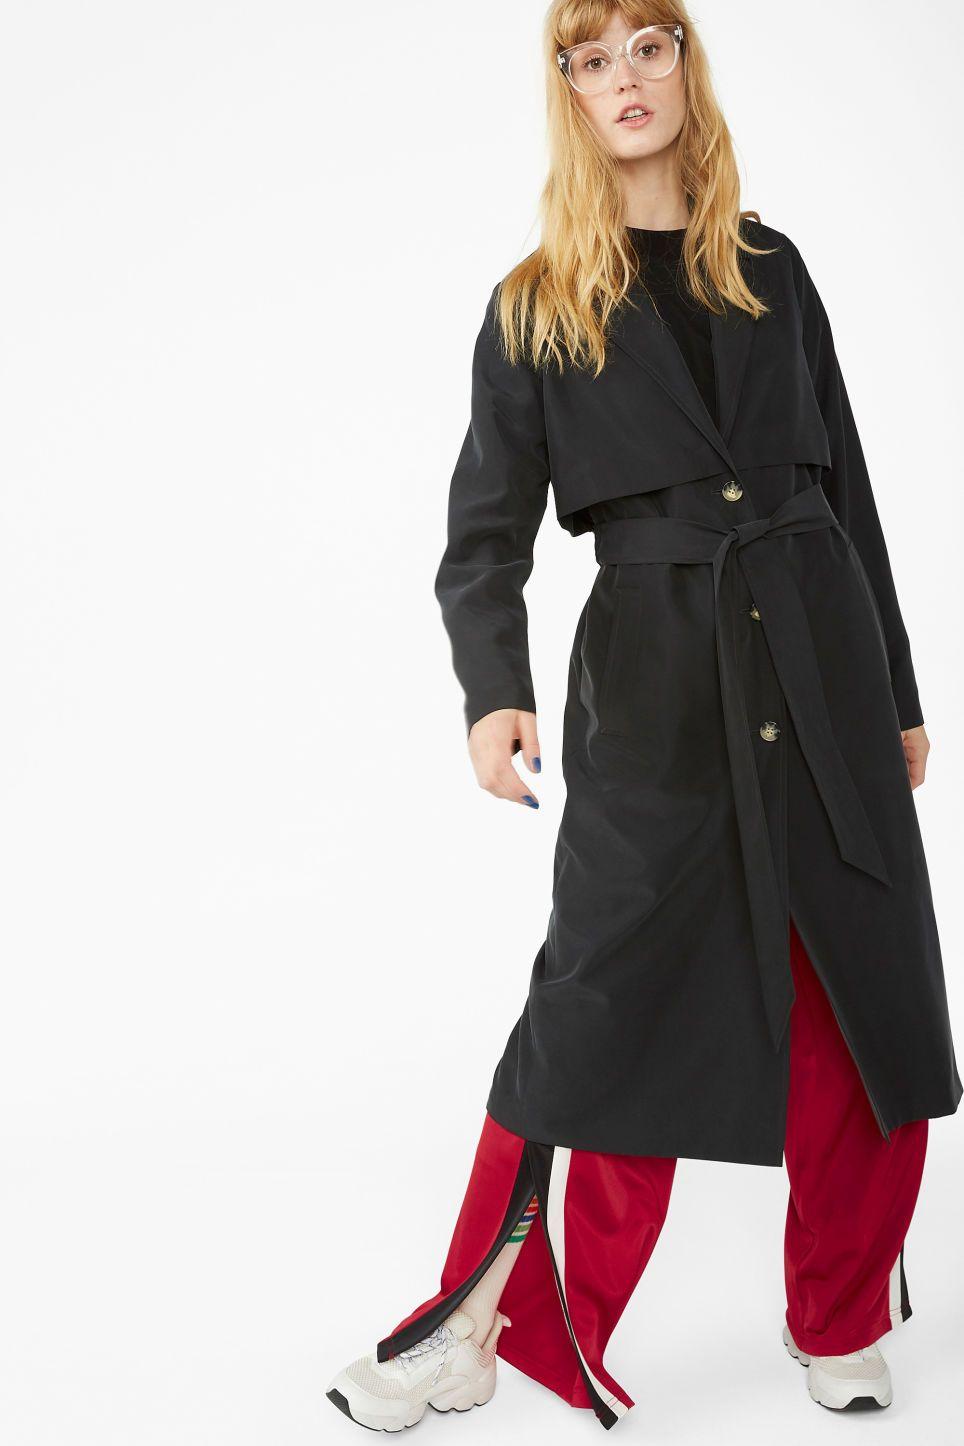 a943bfeb Soft trench coat - Black magic - Coats & Jackets in 2019 | Women's ...